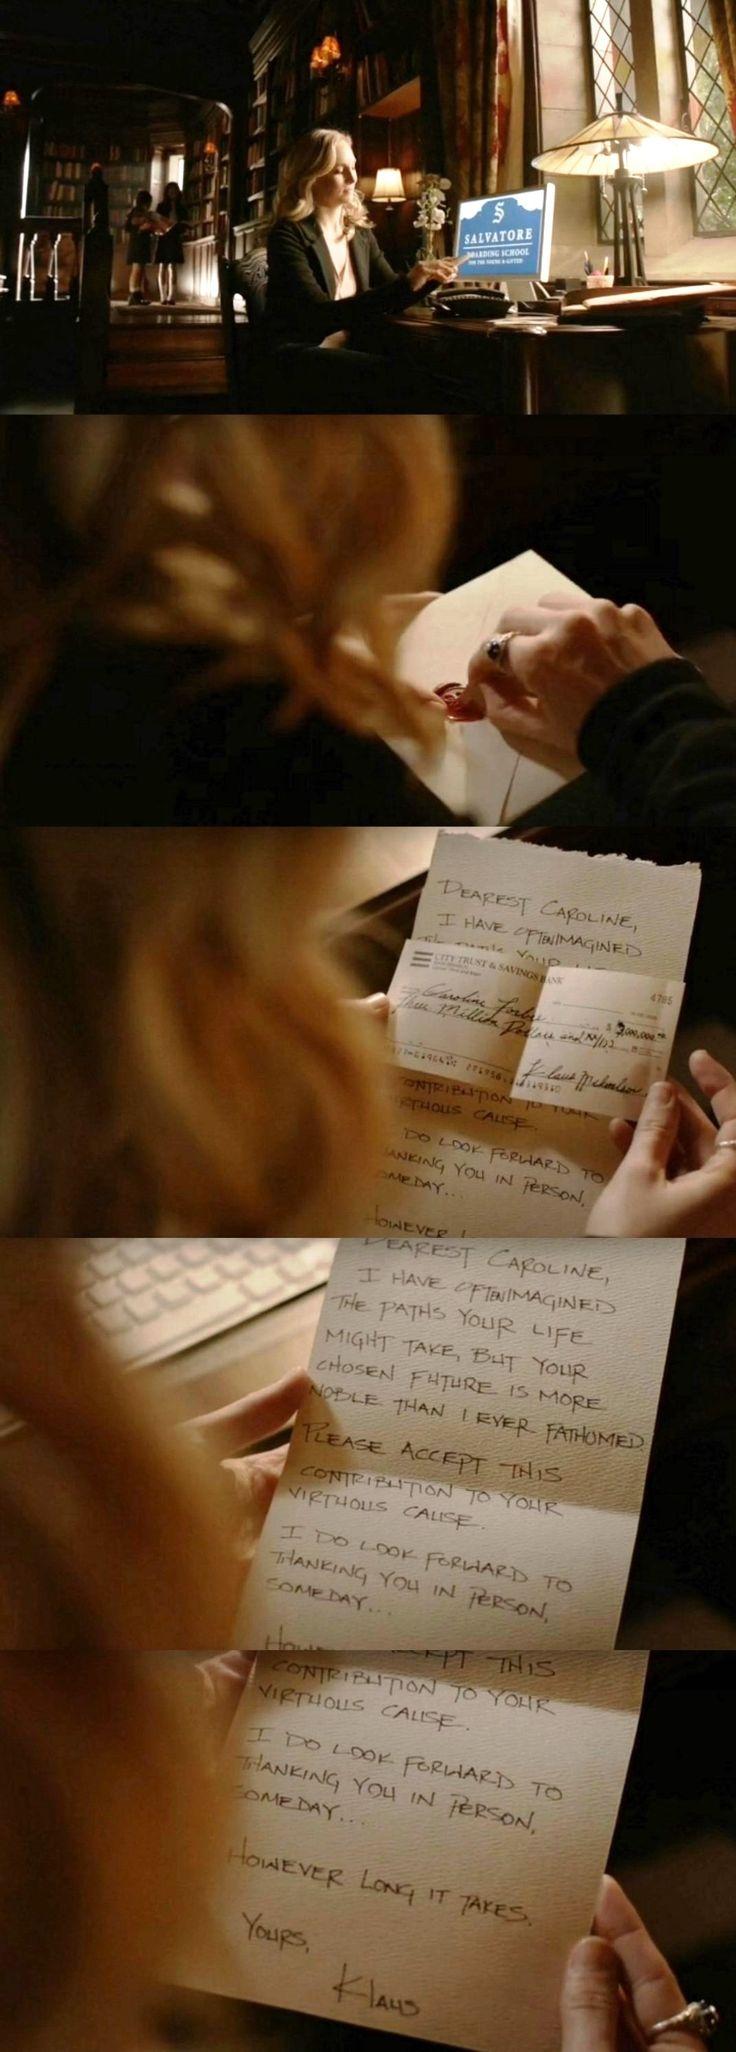 The Vampire Diaries TVD S08E16/Season finale - Caroline & Klaus